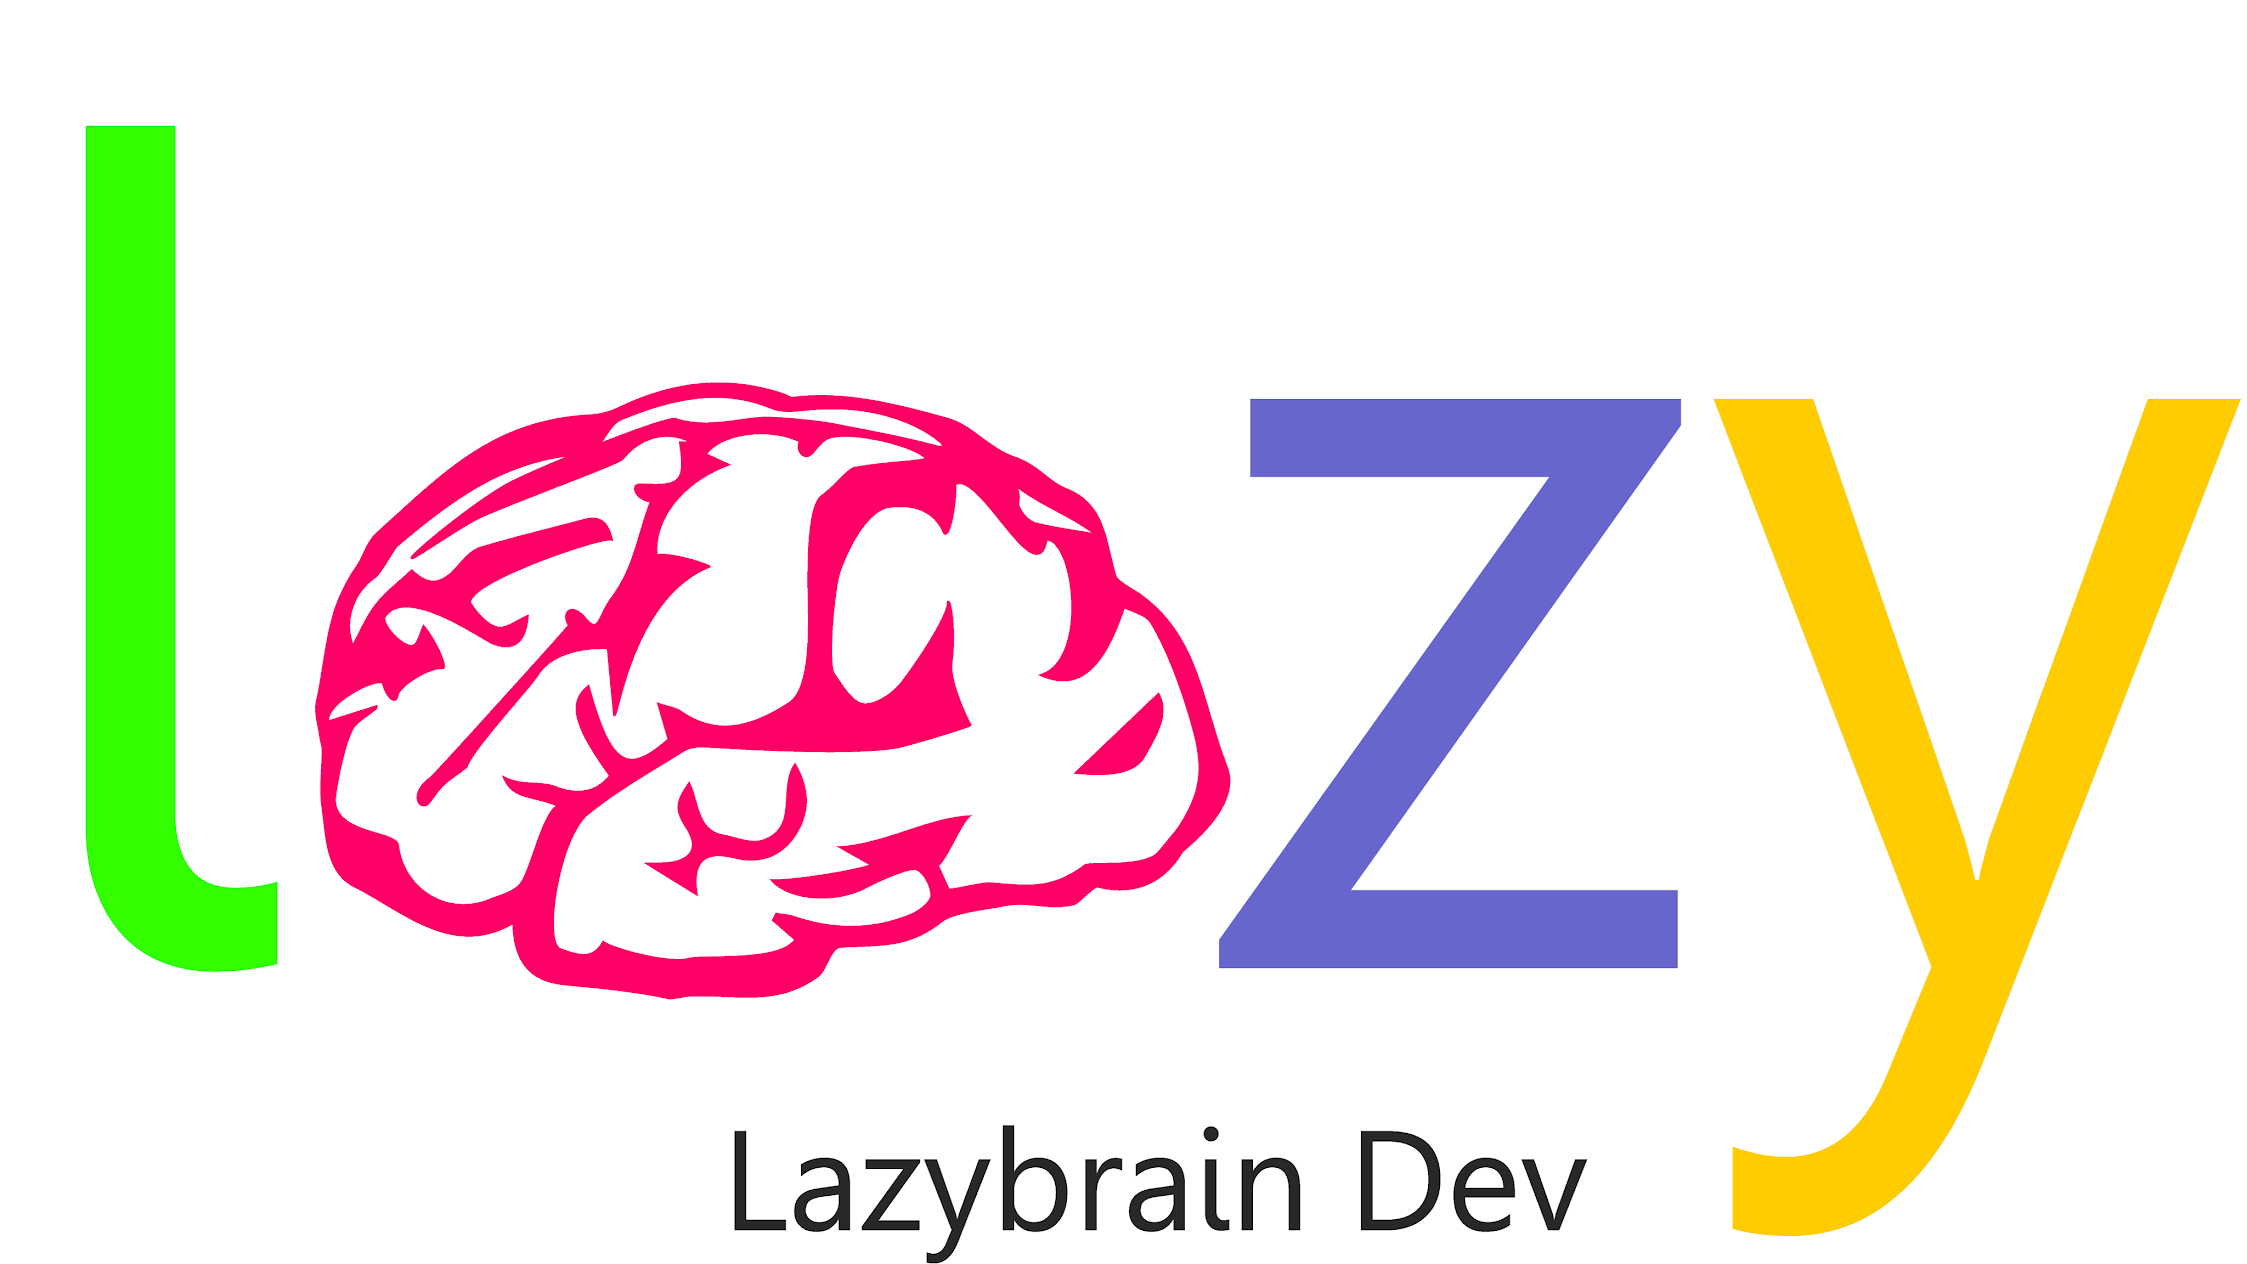 Lazybrain Dev